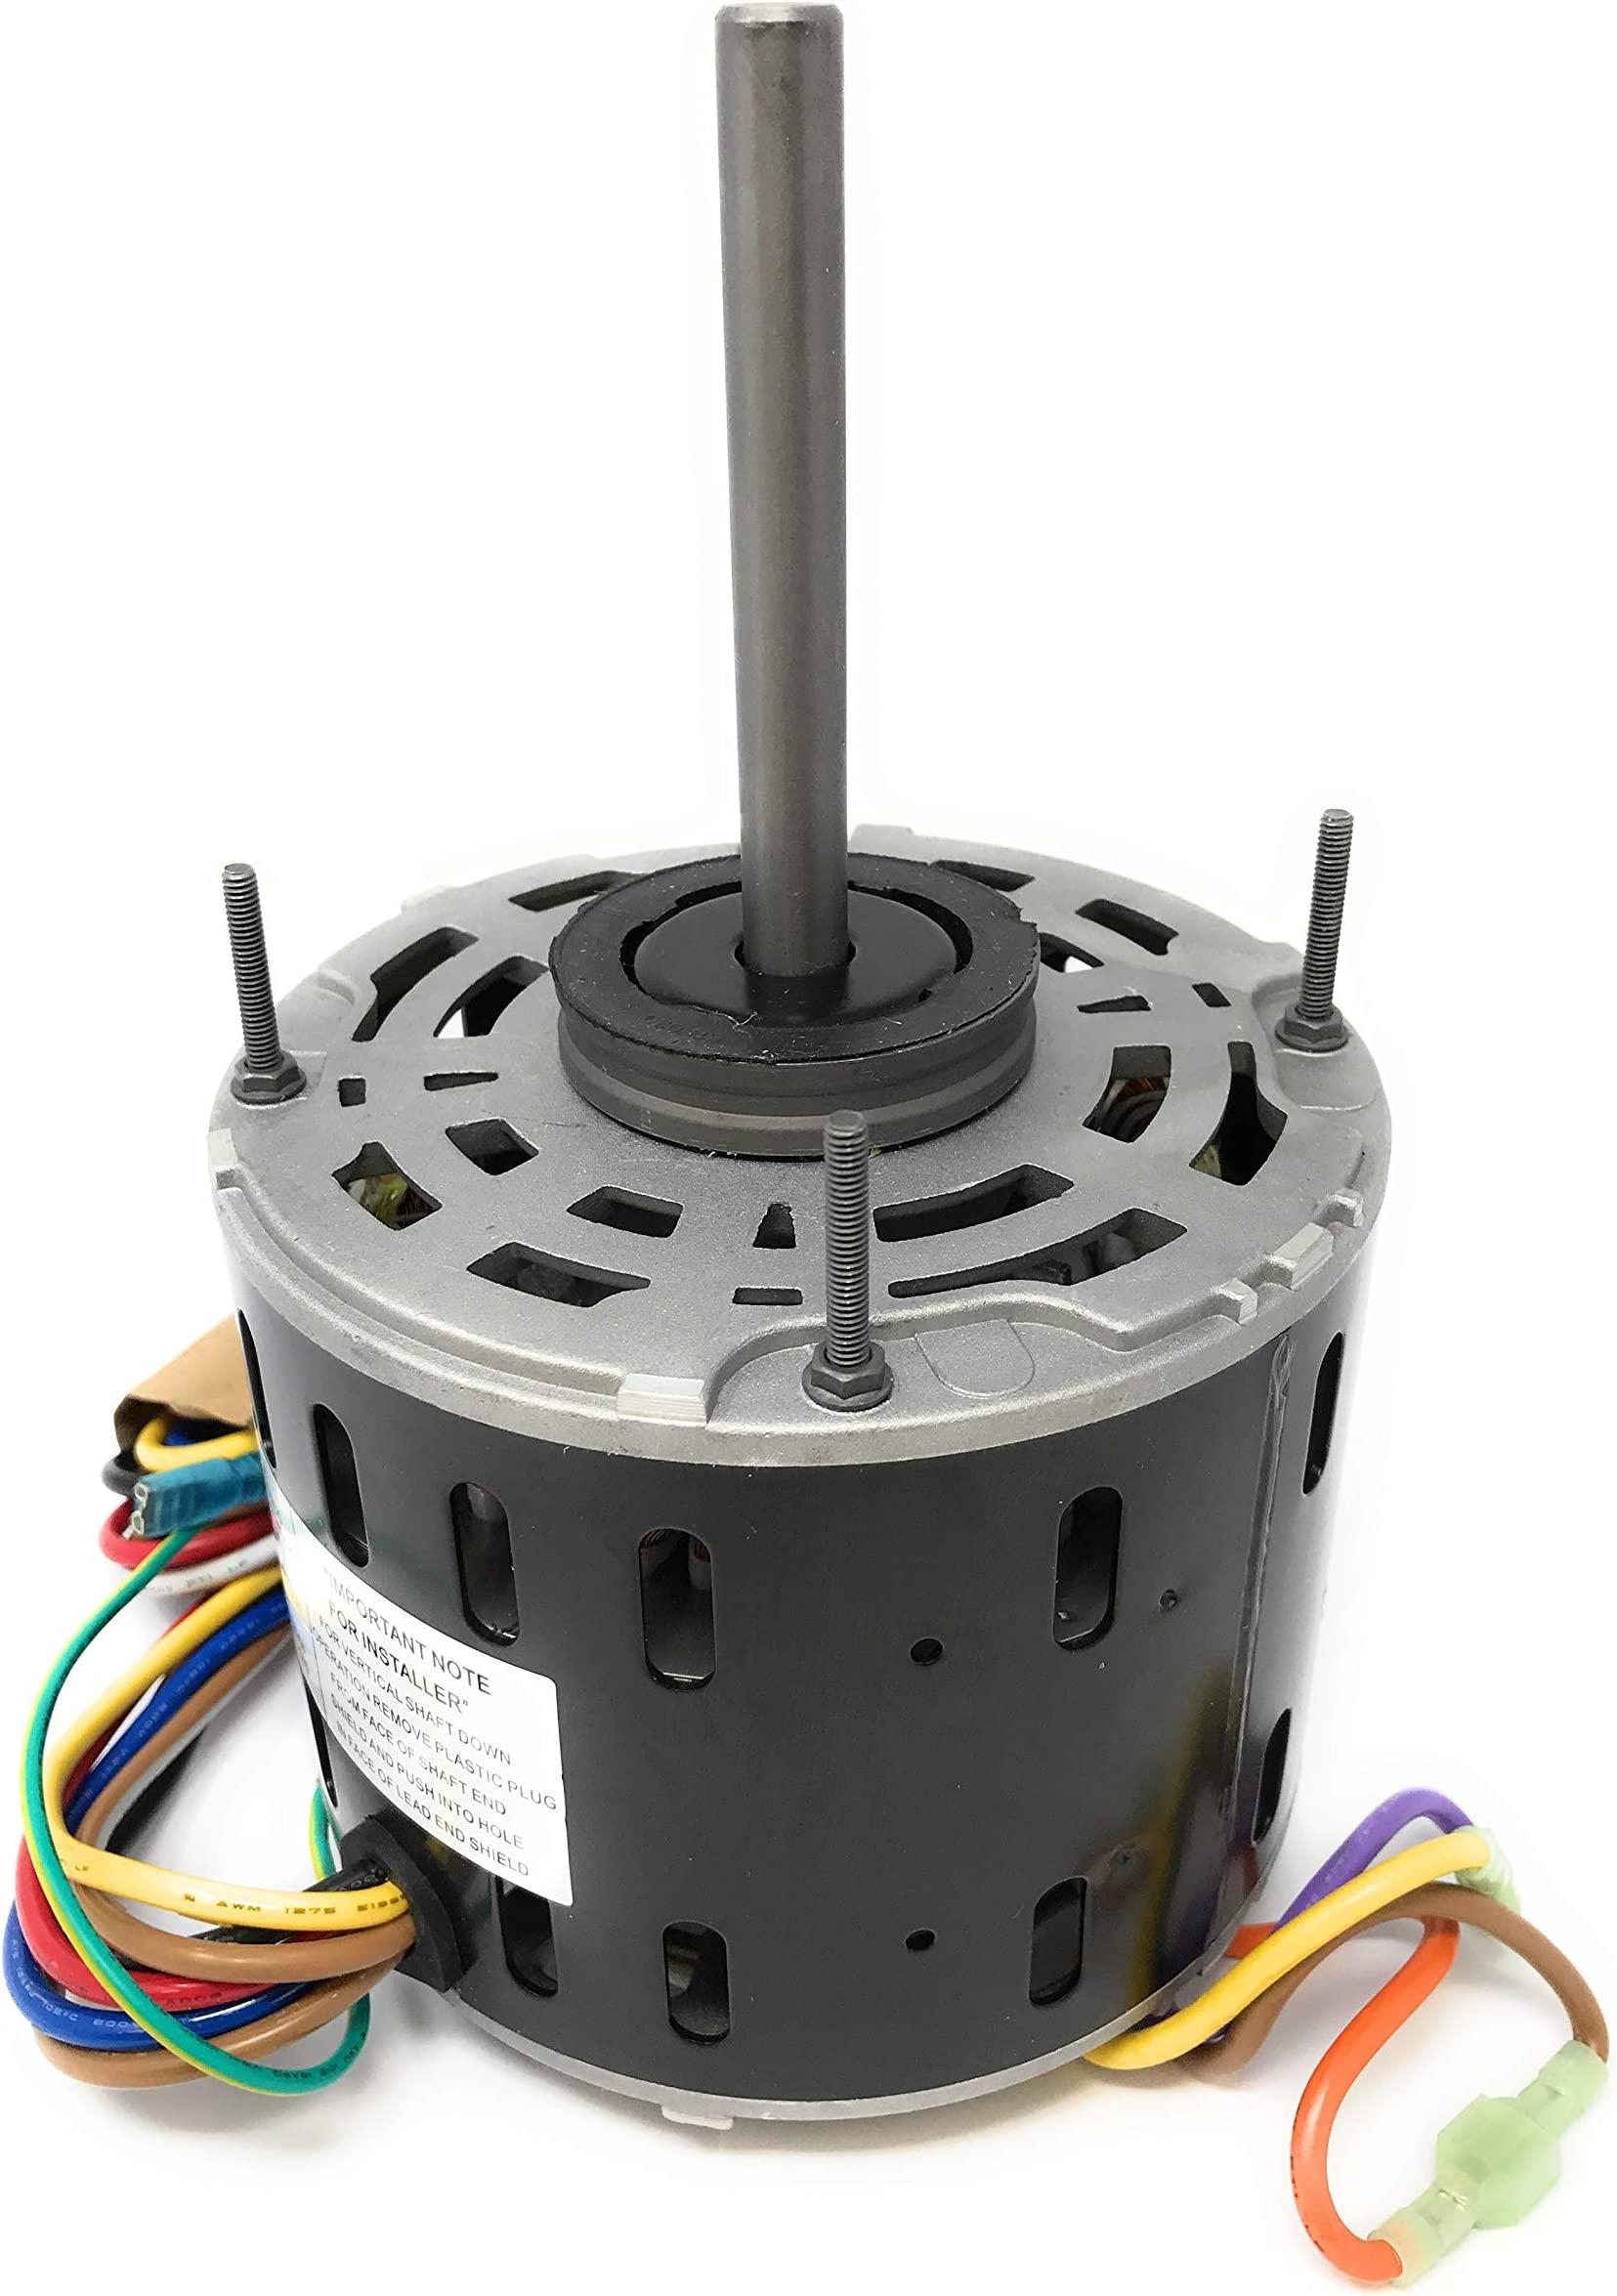 A1585, 1/3HP Furnace Blower Motor, 115V, 1075RPM, 6.1AMP - - Amazon.comAmazon.com